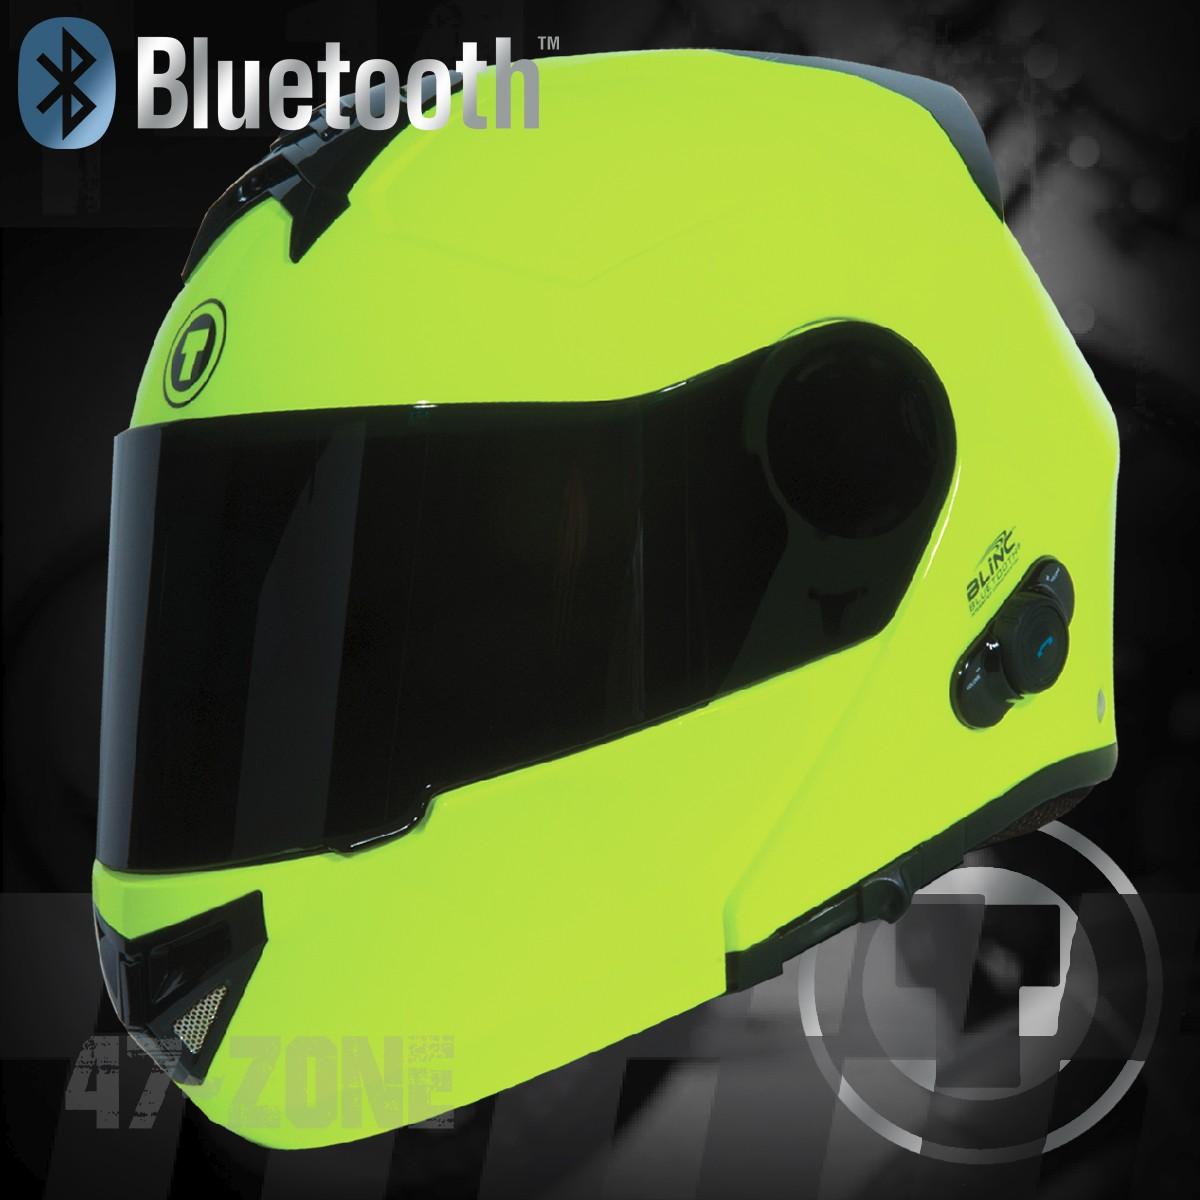 Torc Avenger T27 Hiviz Green Yellow Bluetooth Modular Motorcycle